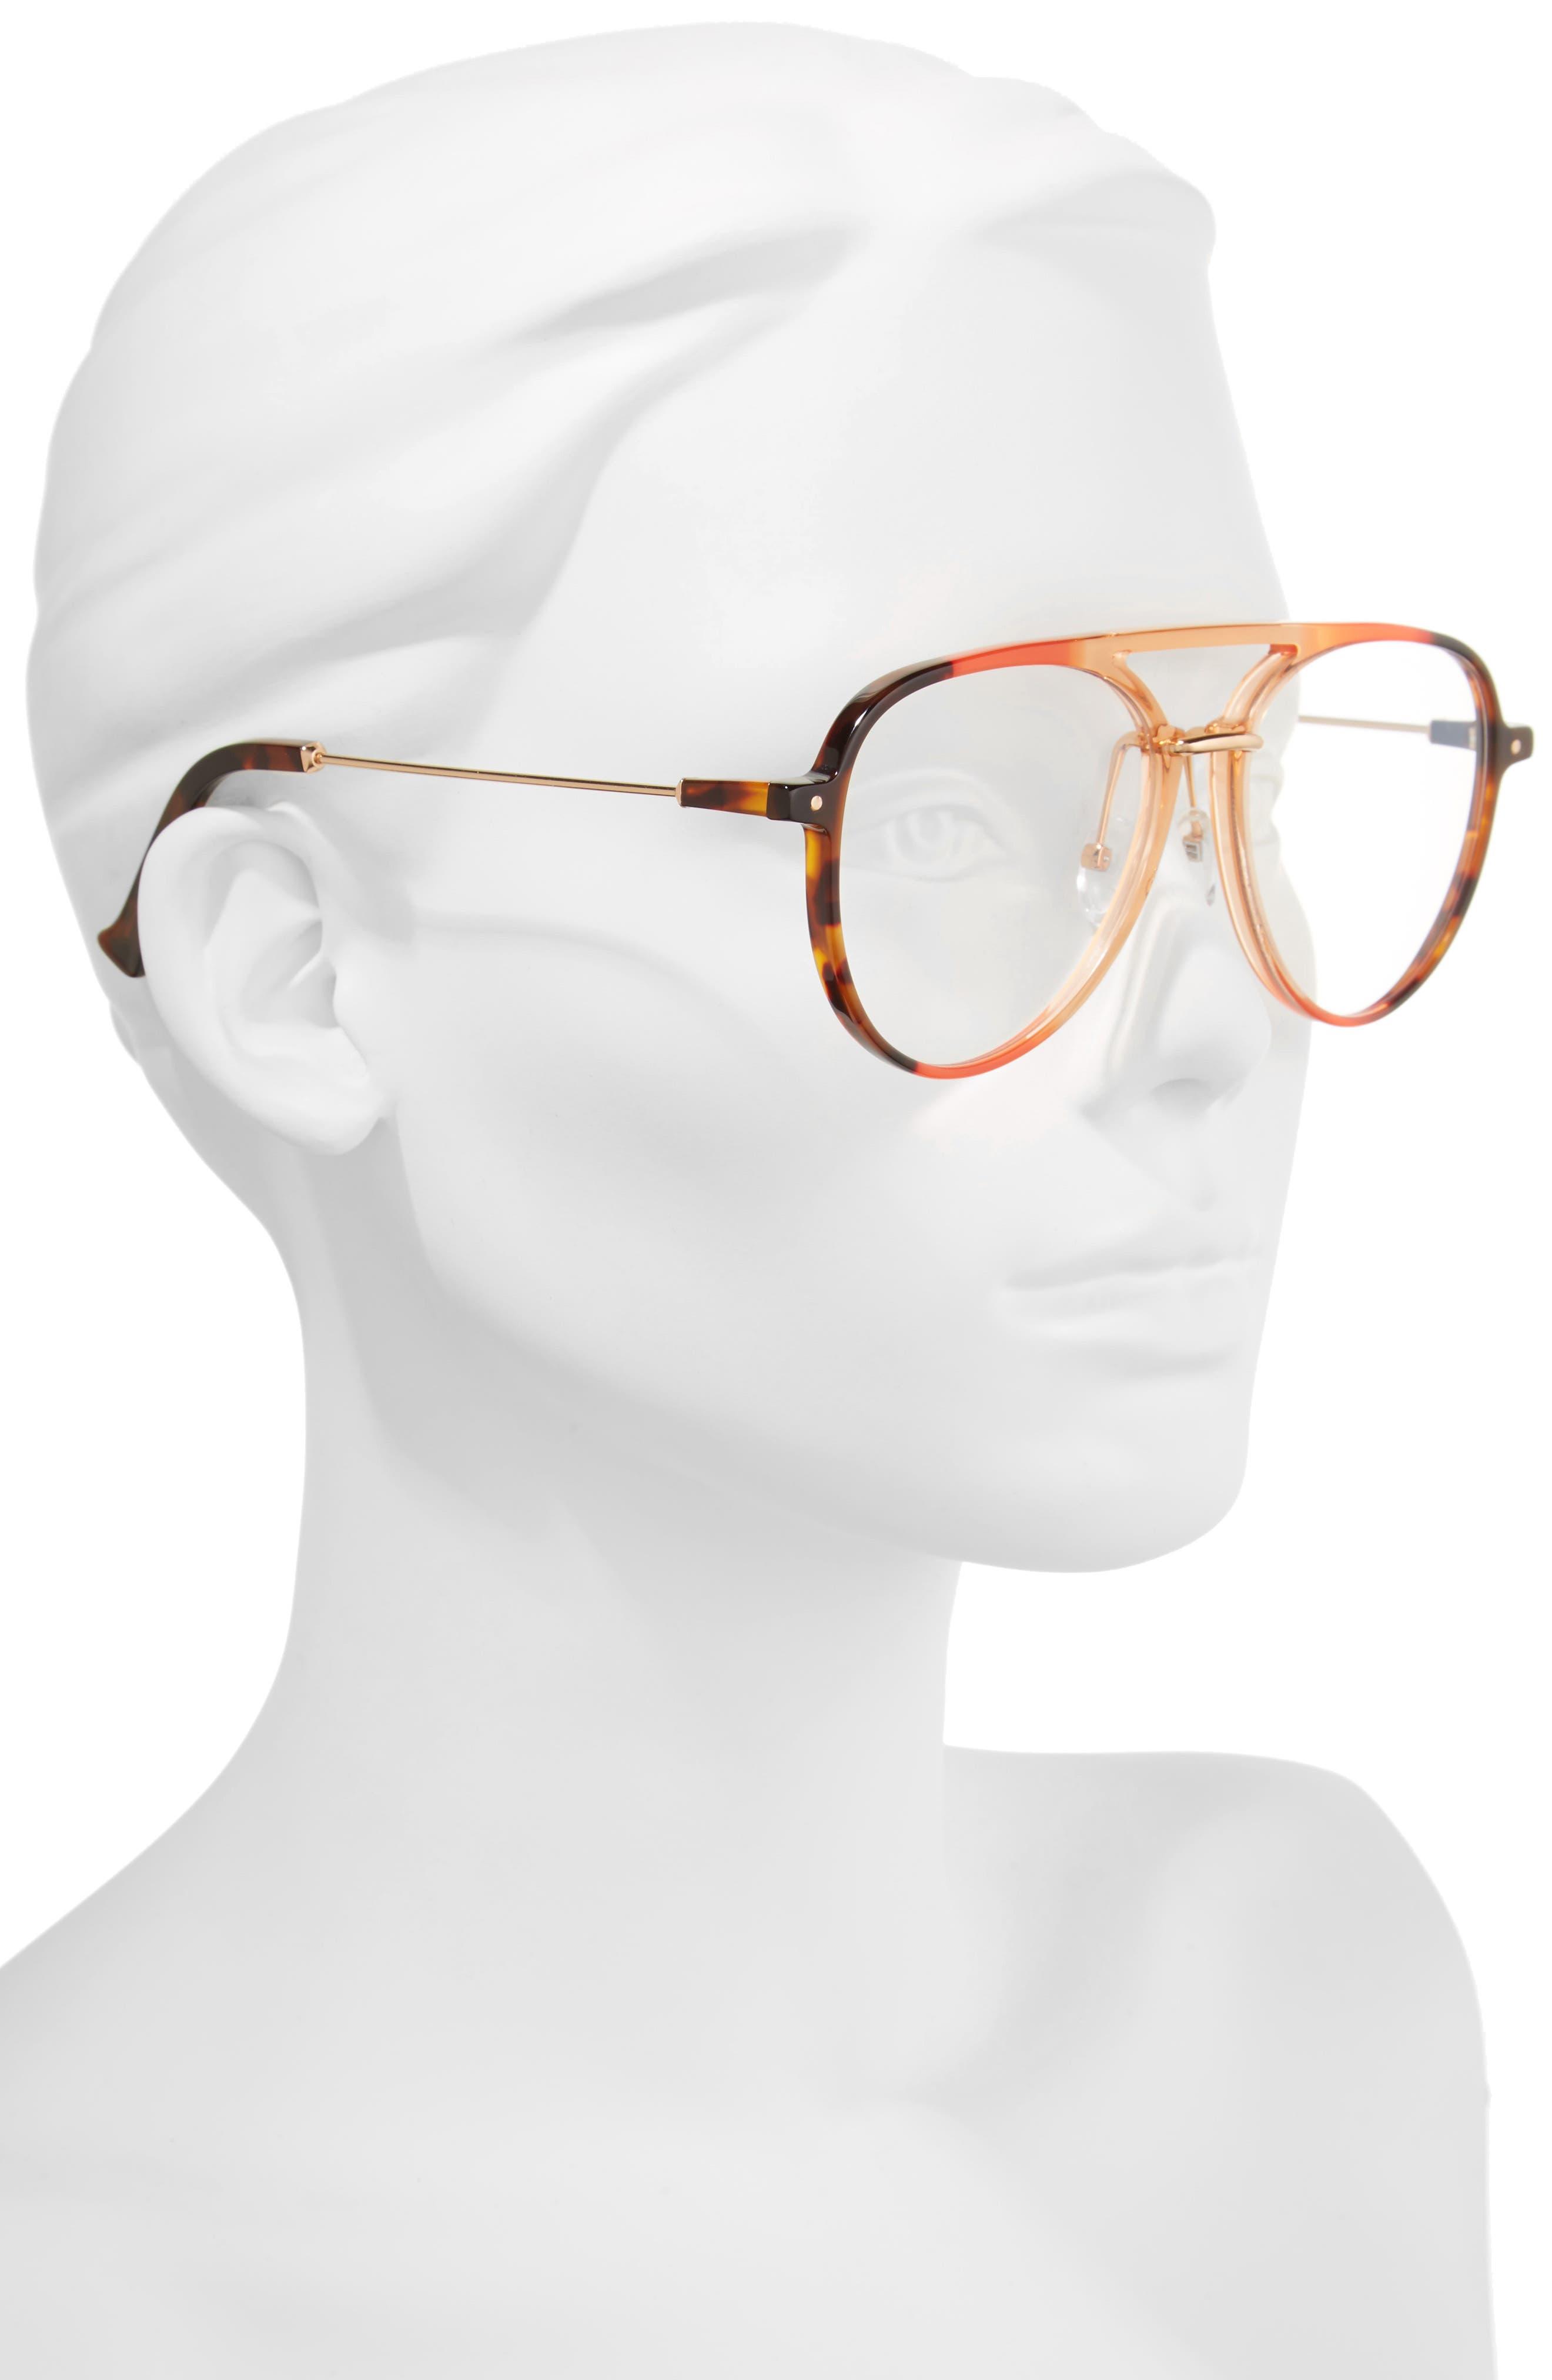 Praph 57mm Aviator Glasses,                             Alternate thumbnail 2, color,                             Clear/Amber Tort Hardware